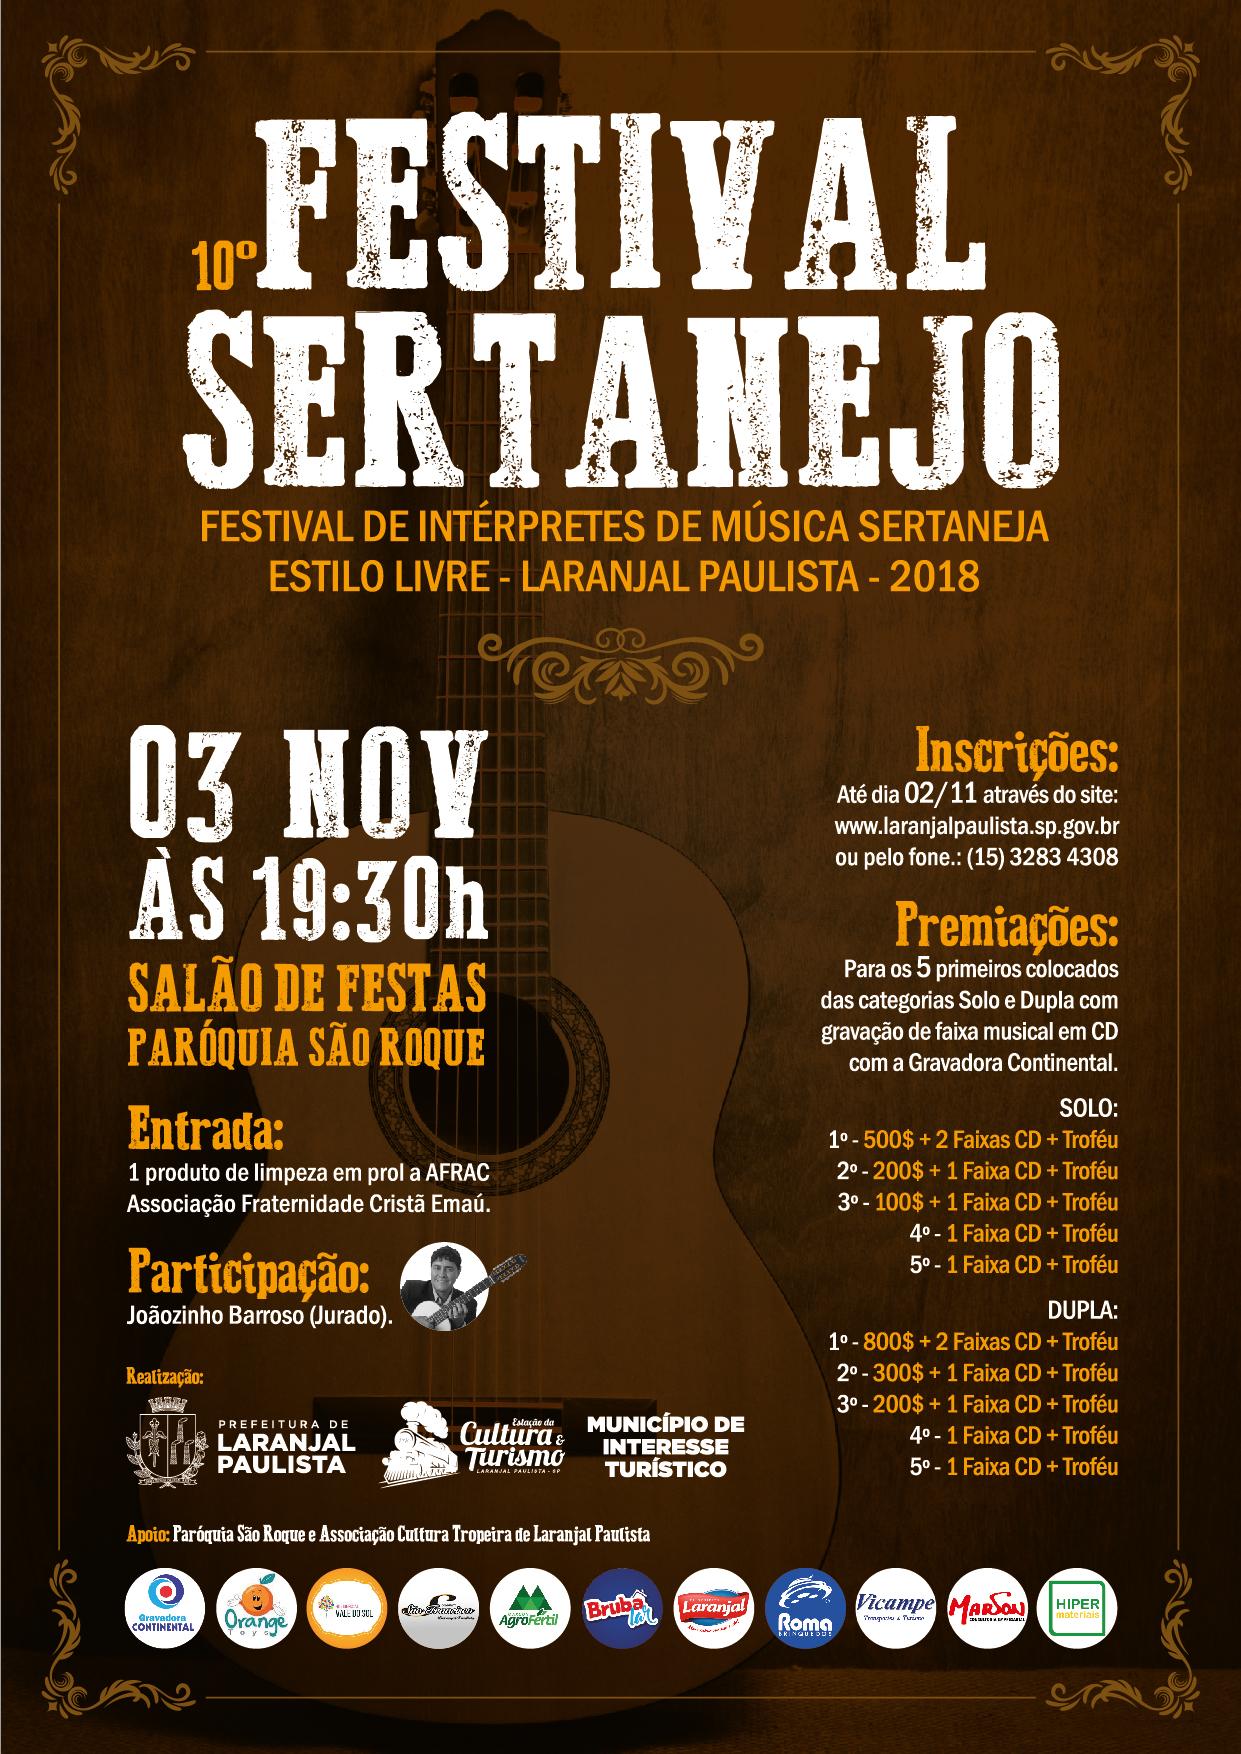 10º Festival Sertanejo - Laranjal Paulista 2018 - INSCREVA-SE AQUI!